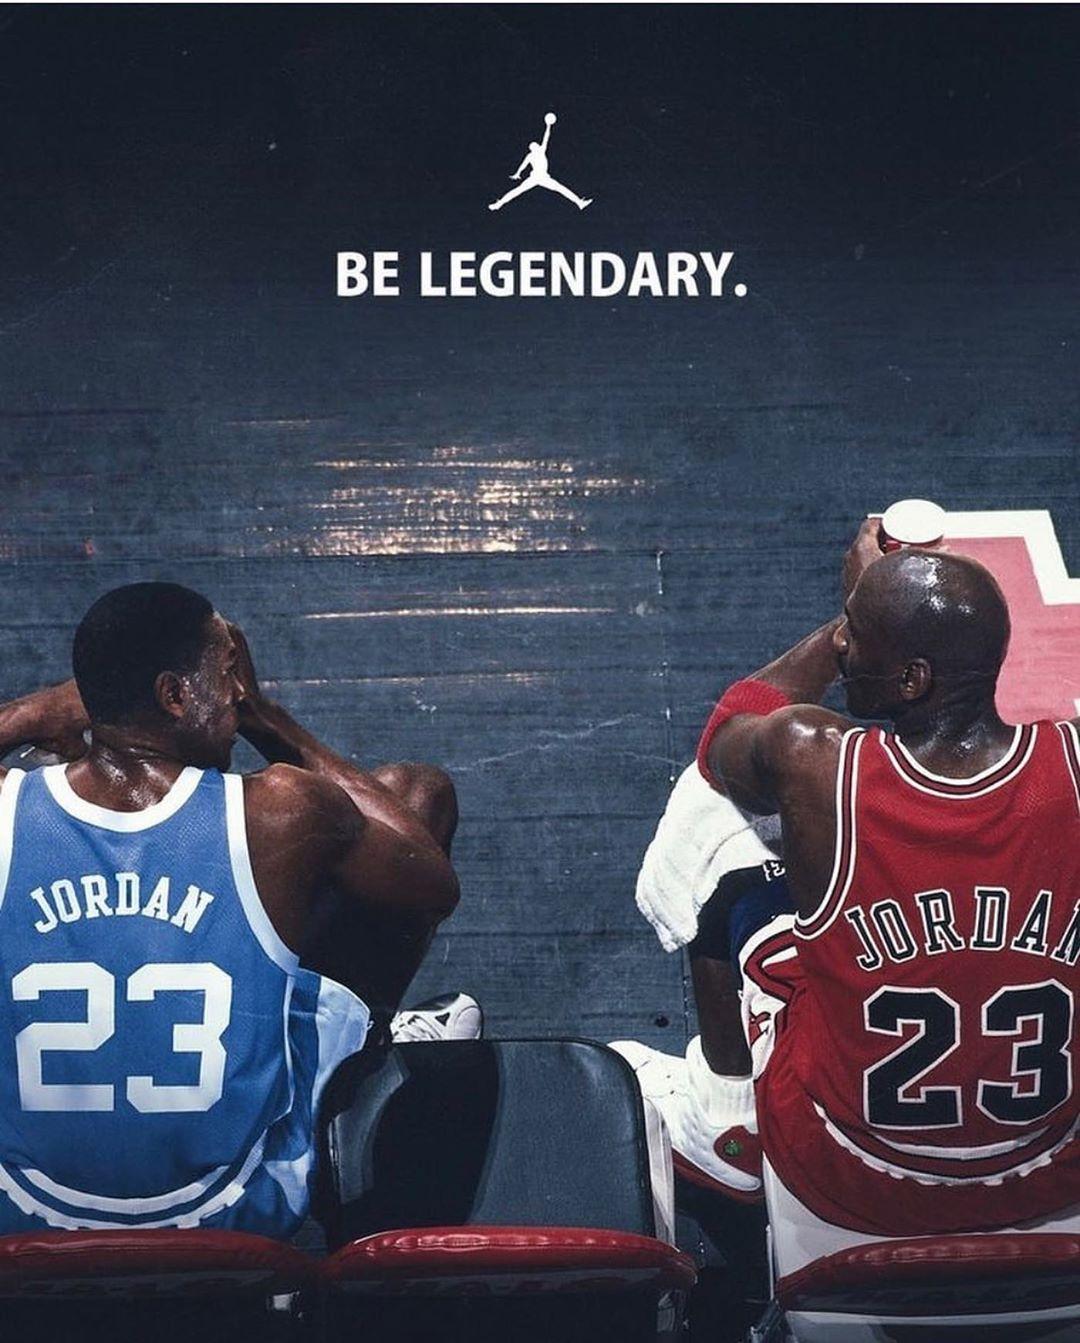 Pin By Kyrsten Crawford On Discipline In 2021 Kobe Bryant Wallpaper Kobe Bryant Poster Kobe Bryant Pictures